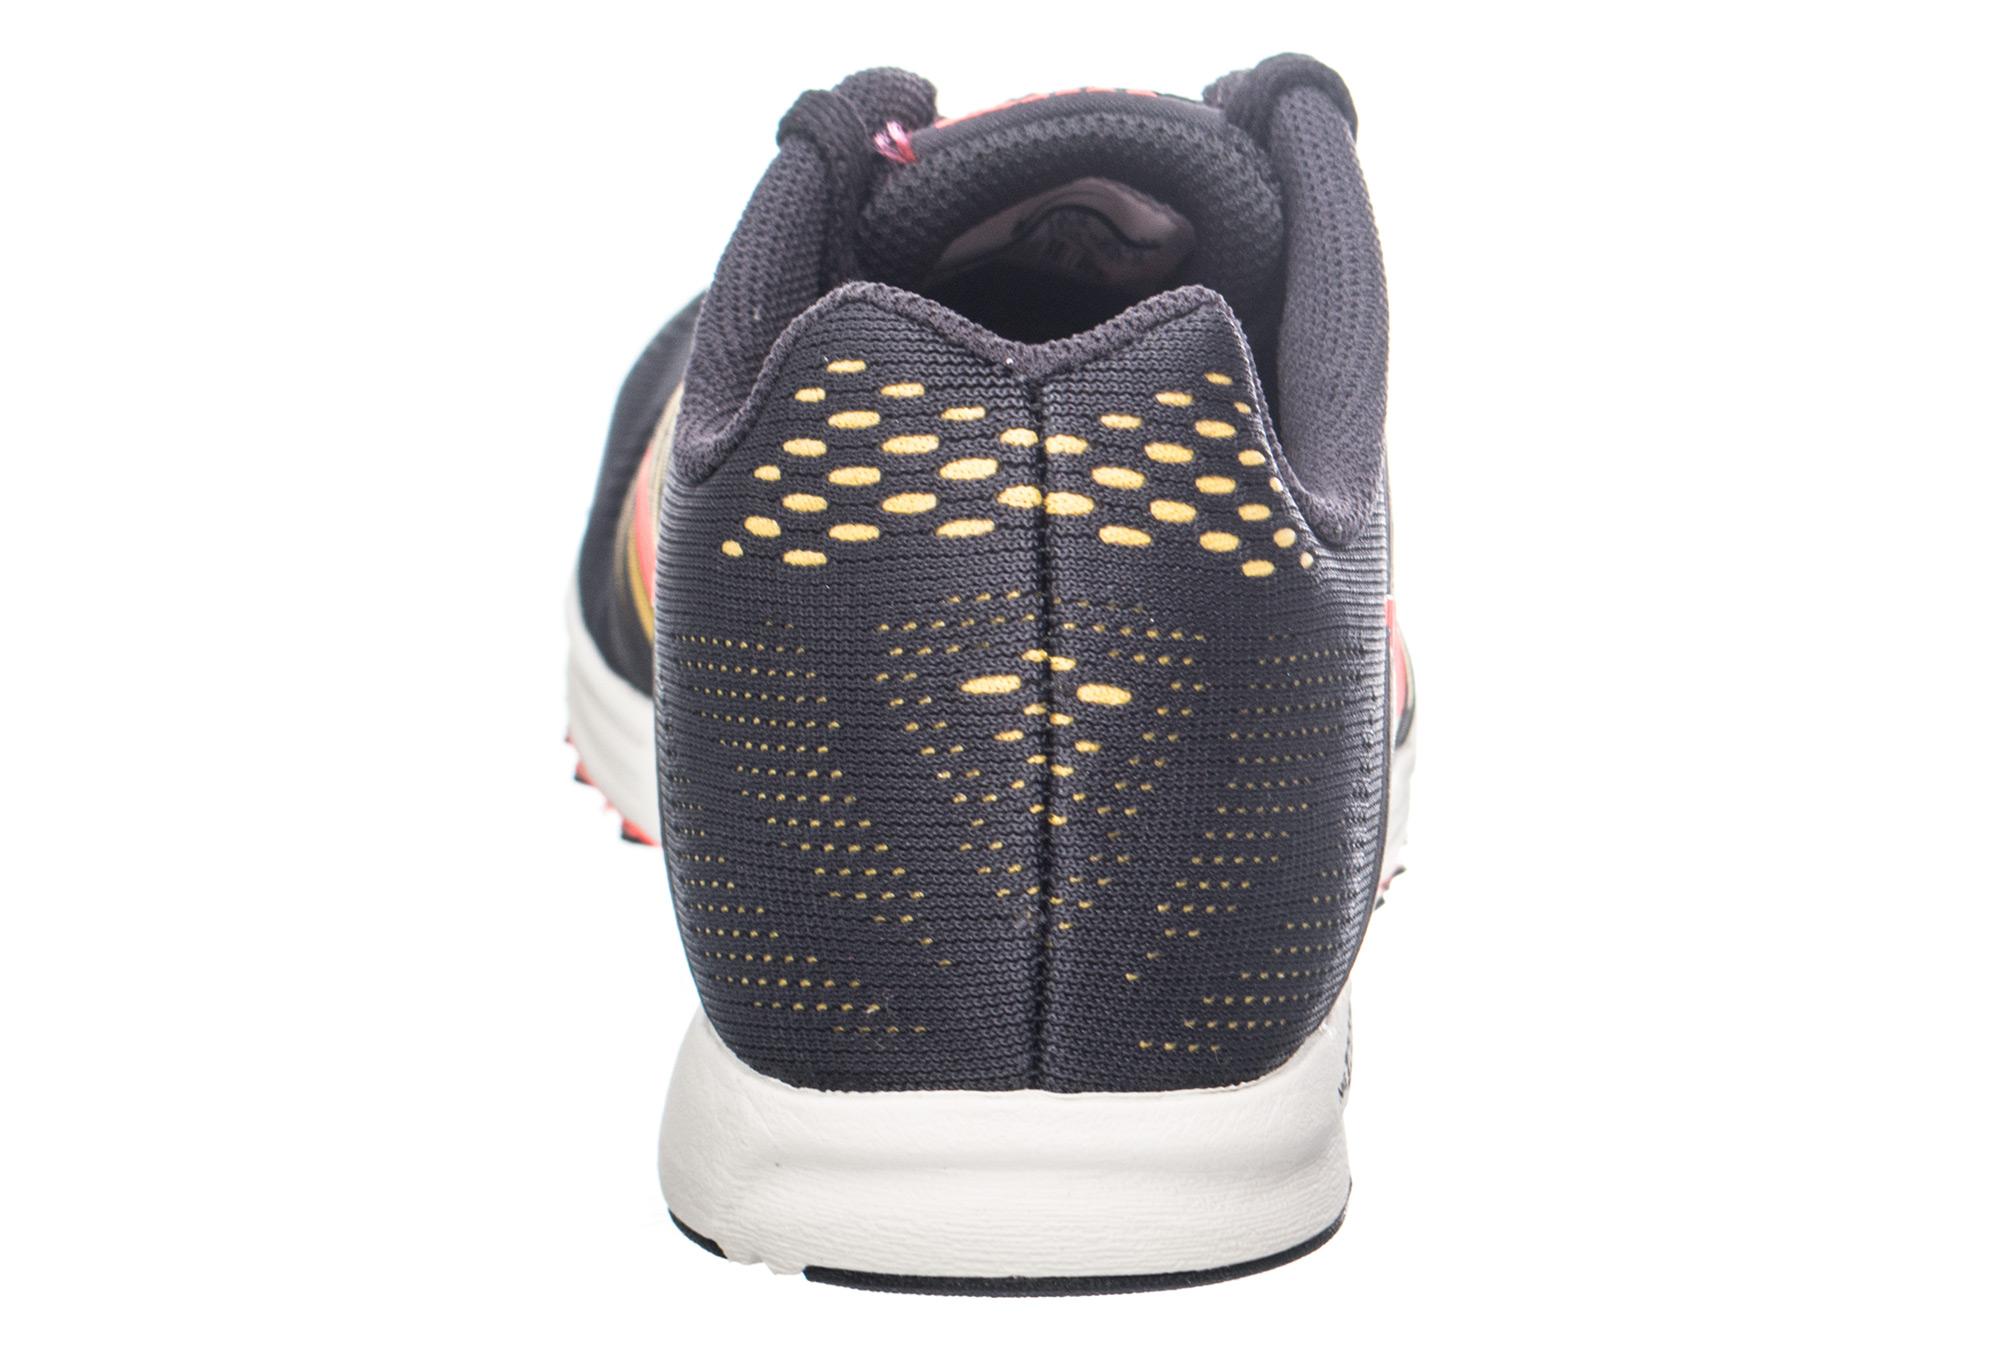 ocupado horno Circunferencia  Nike Shoes Air Zoom Speed Racer 6 Grey Yellow Orange | Alltricks.com